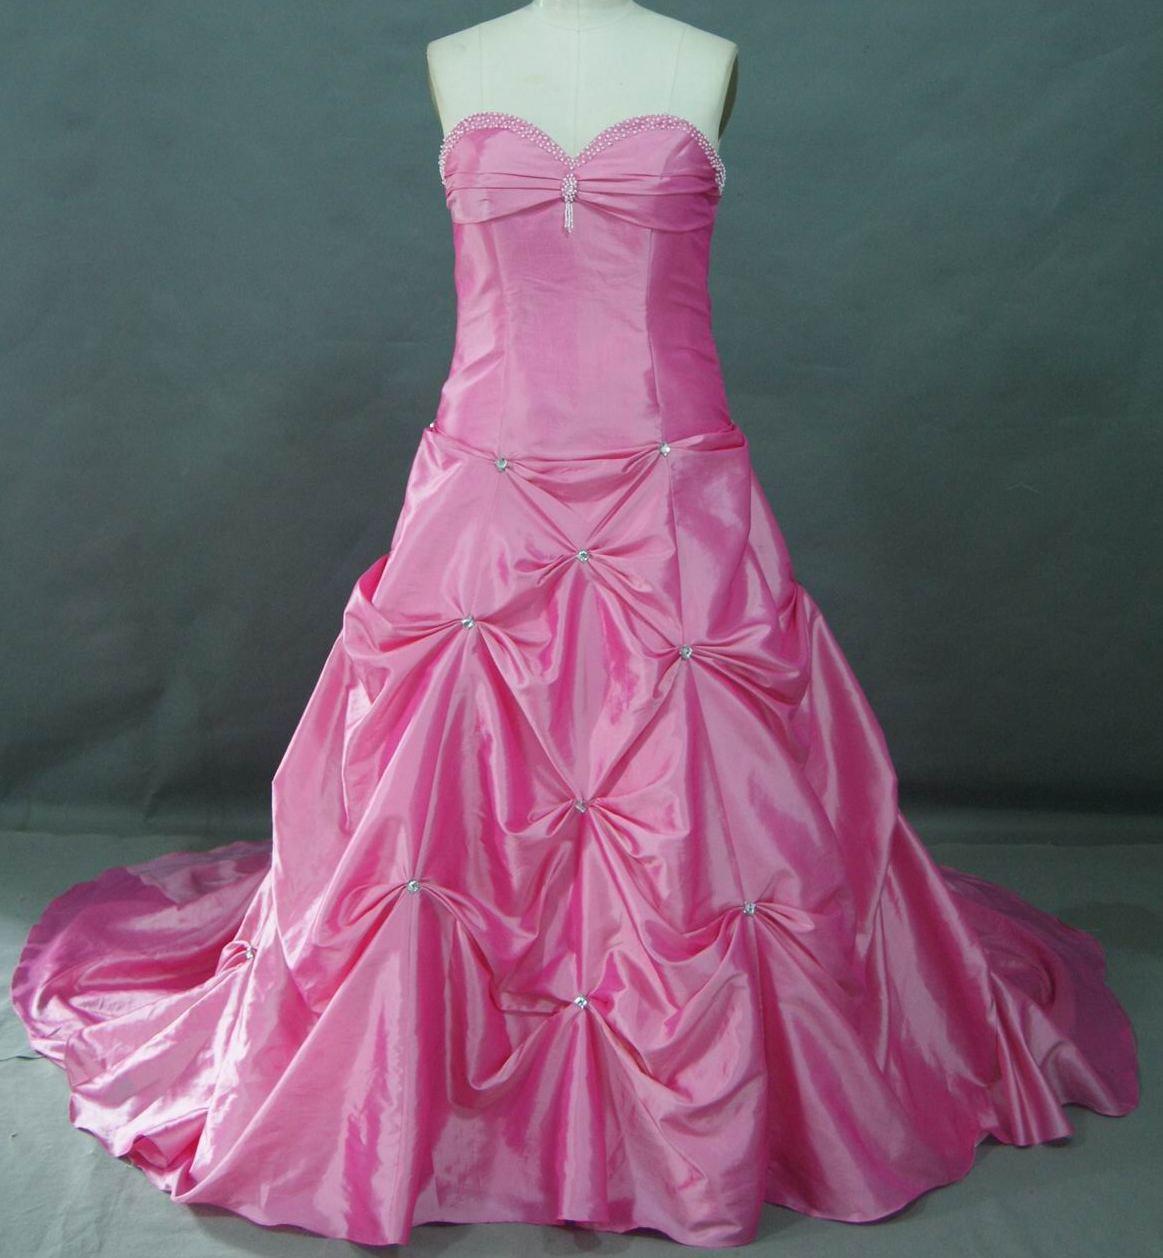 Full bustle skirt red wedding dresses long bubblegum pink dress ombrellifo Images